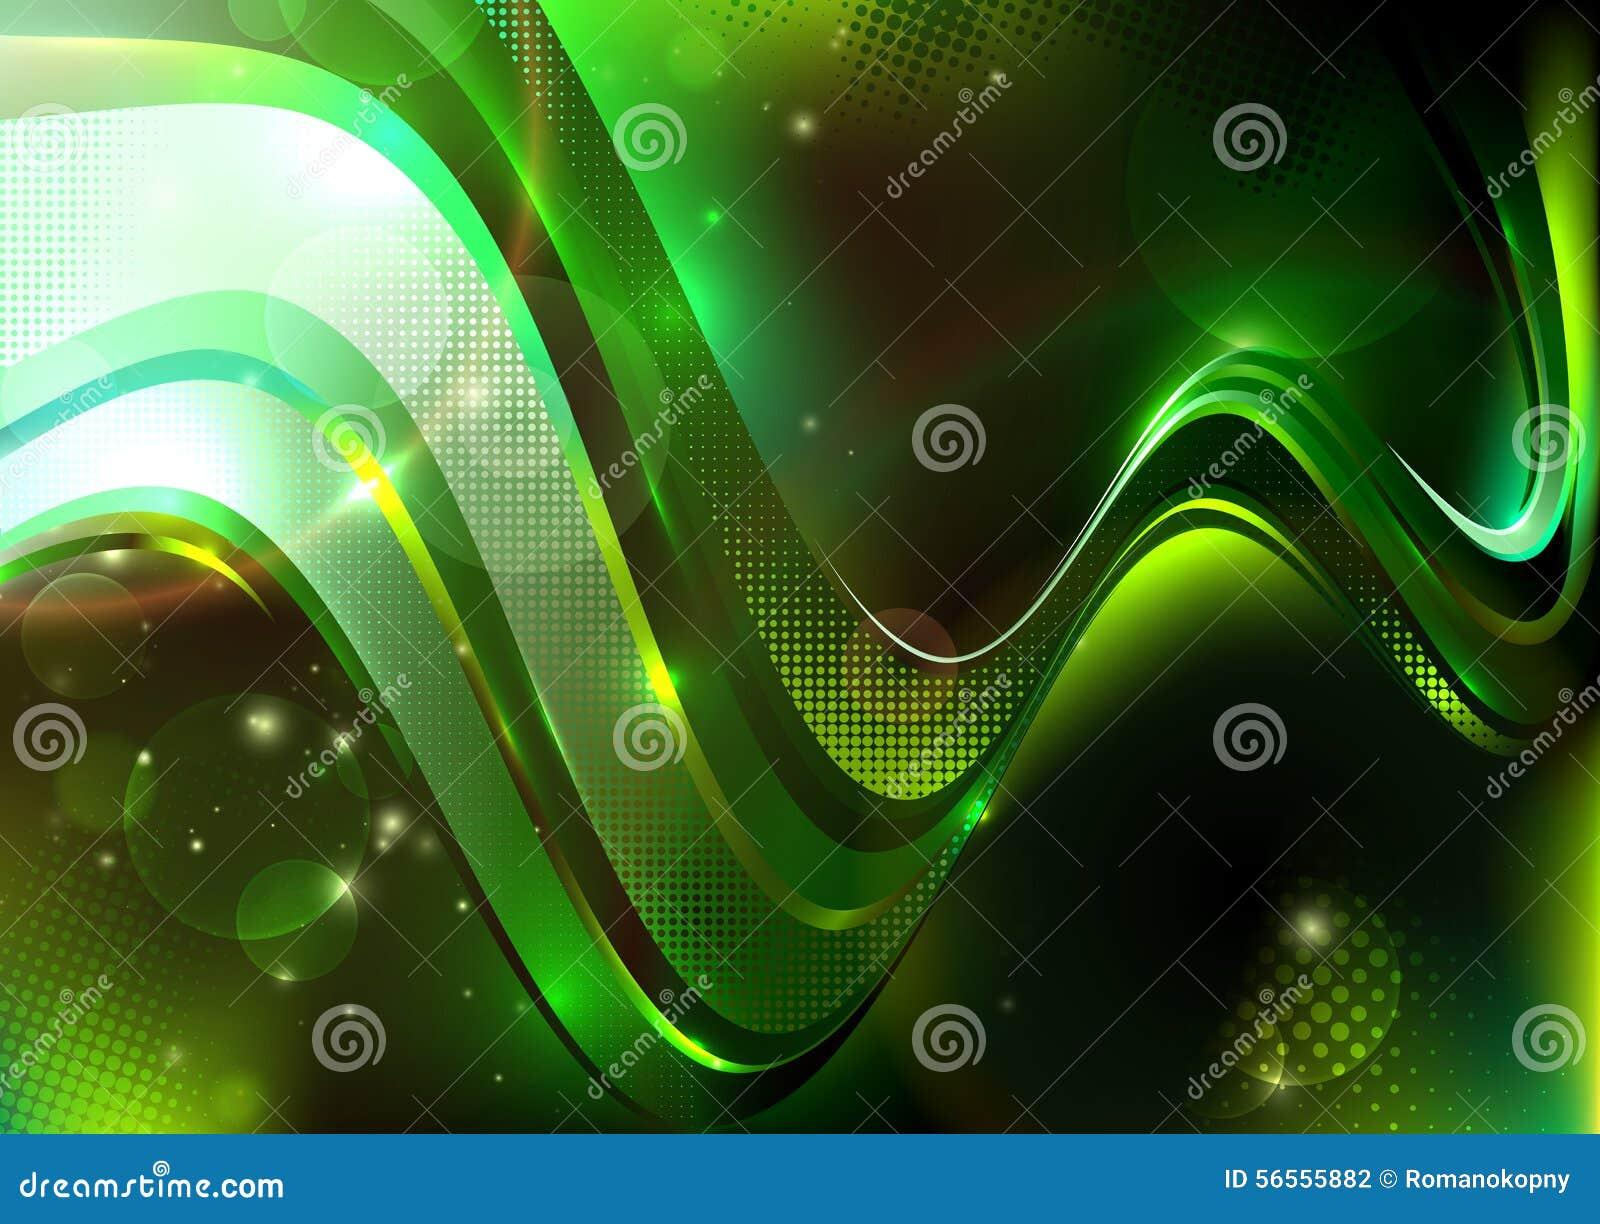 Download Πράσινη διαστιγμένη σύνθεση Διανυσματική απεικόνιση - εικονογραφία από ροή, απεικόνιση: 56555882